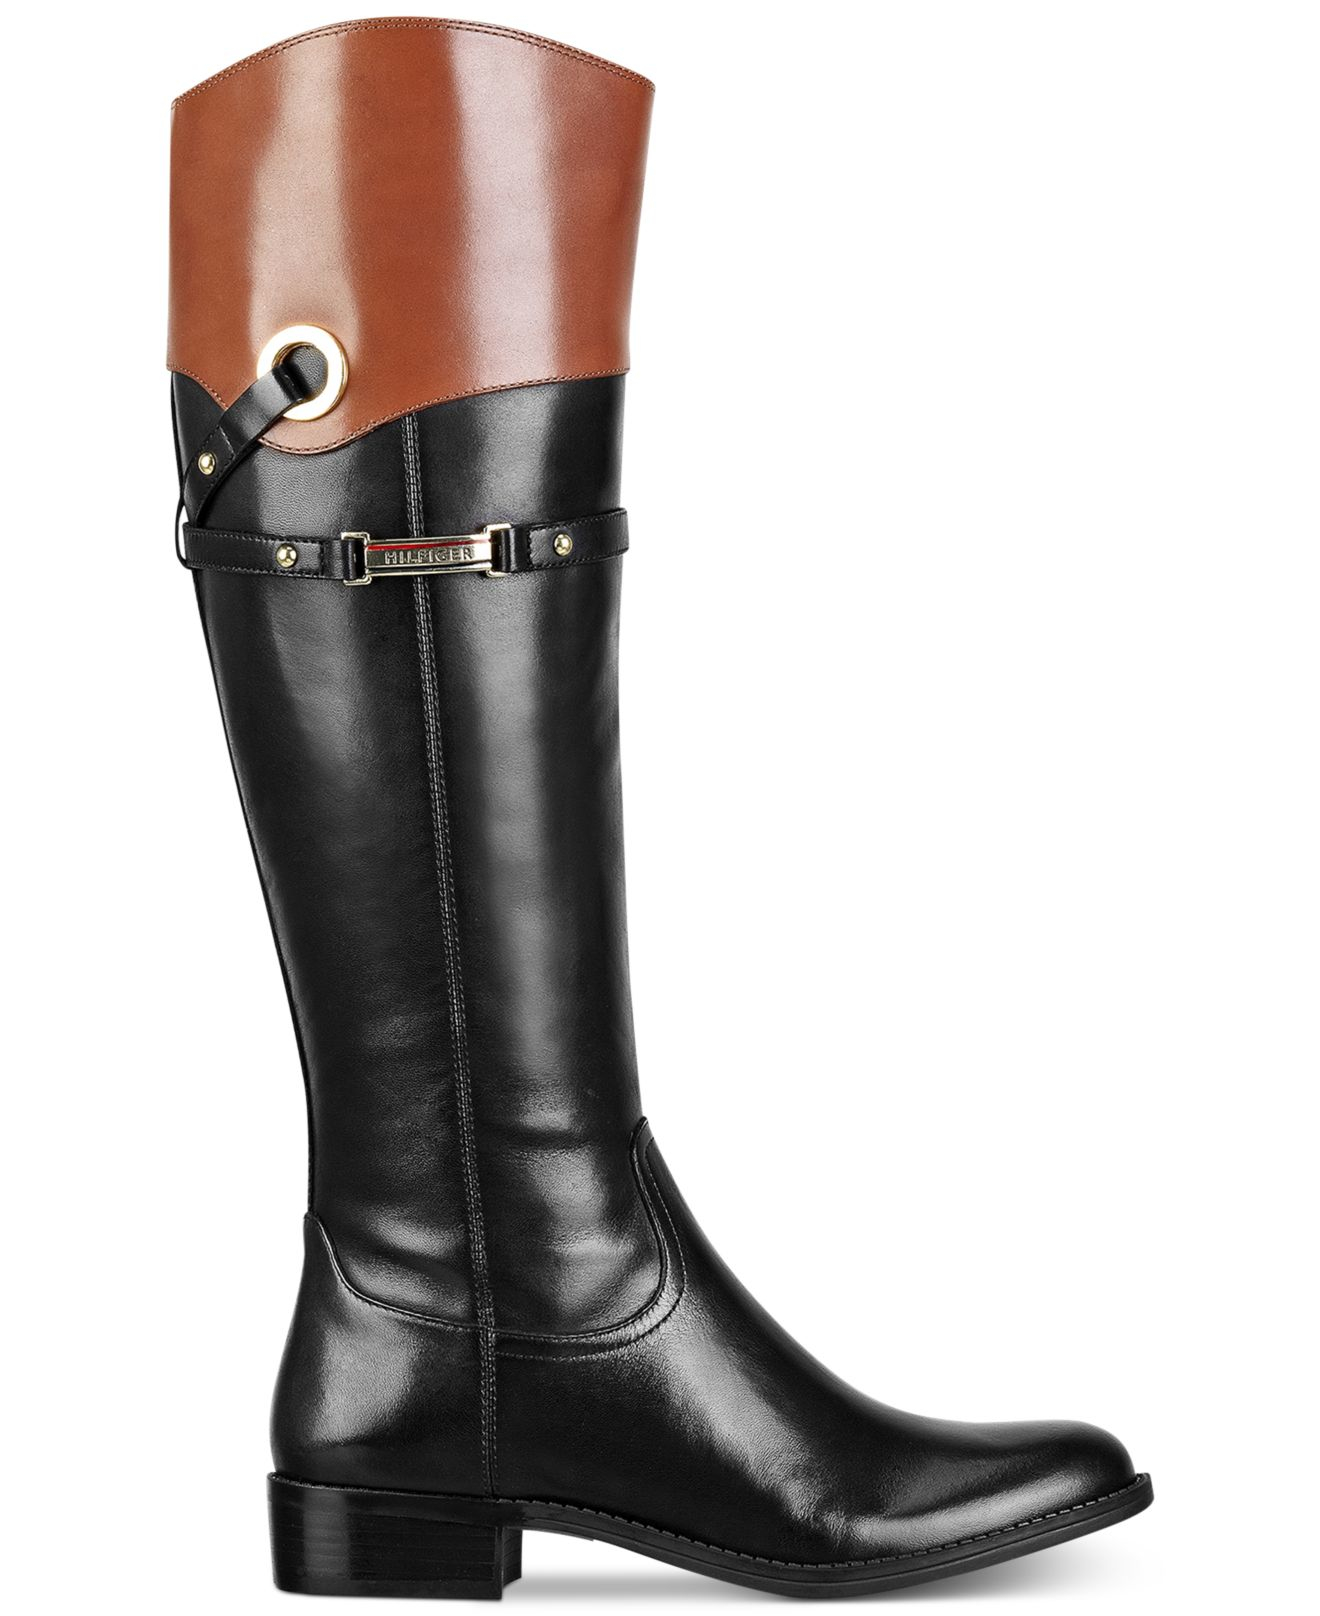 tommy hilfiger delphy wide calf riding boots in black. Black Bedroom Furniture Sets. Home Design Ideas